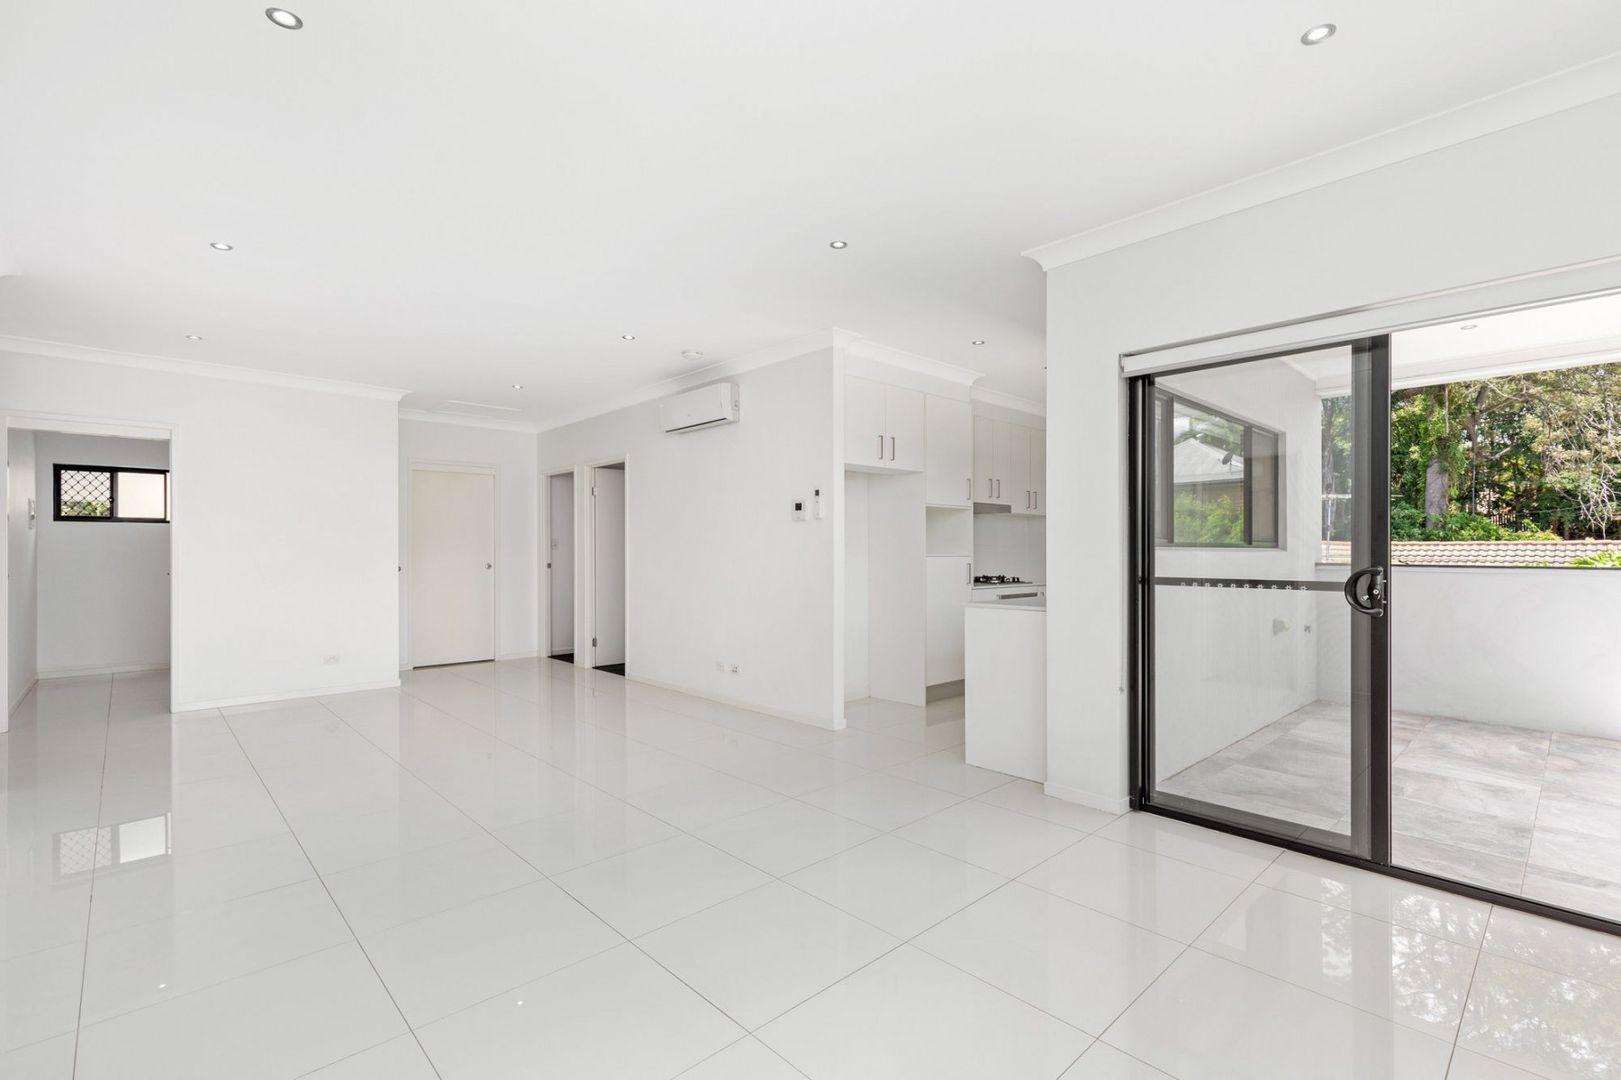 8/60 Thynne Road, Morningside QLD 4170, Image 2